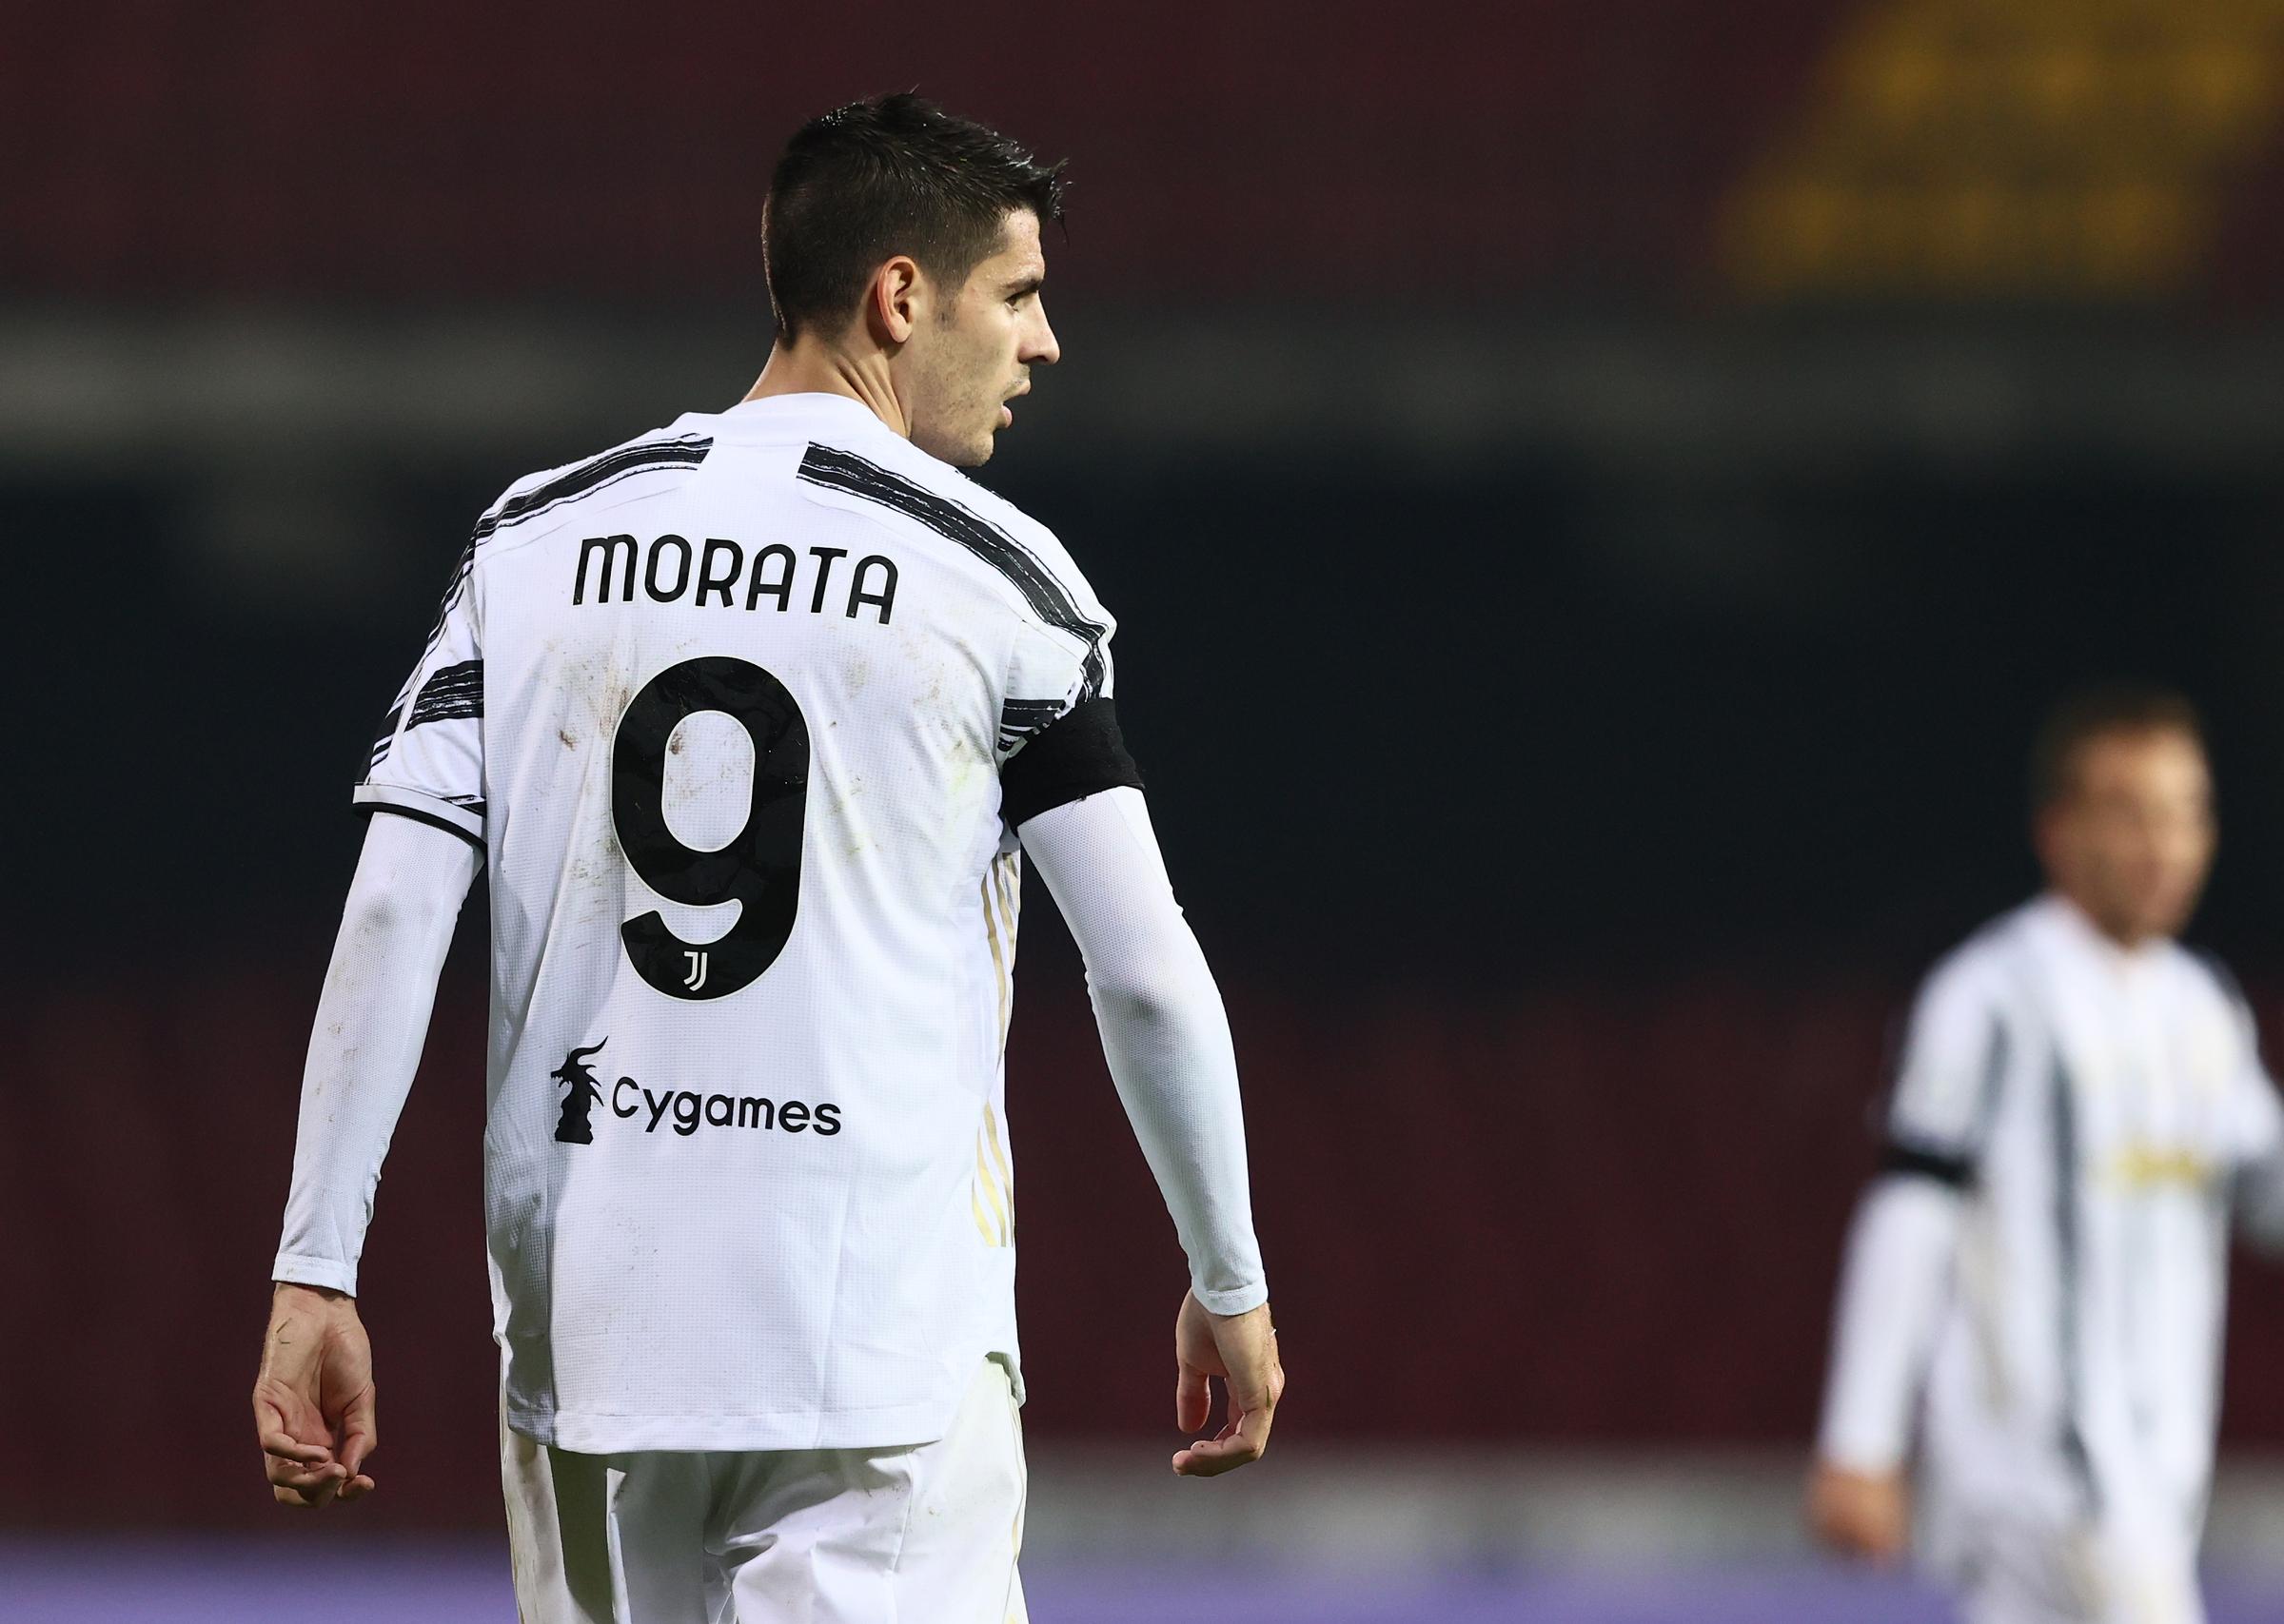 Serie A, la Juve non vince senza Ronaldo: 1-1 a Benevento - LaPresse